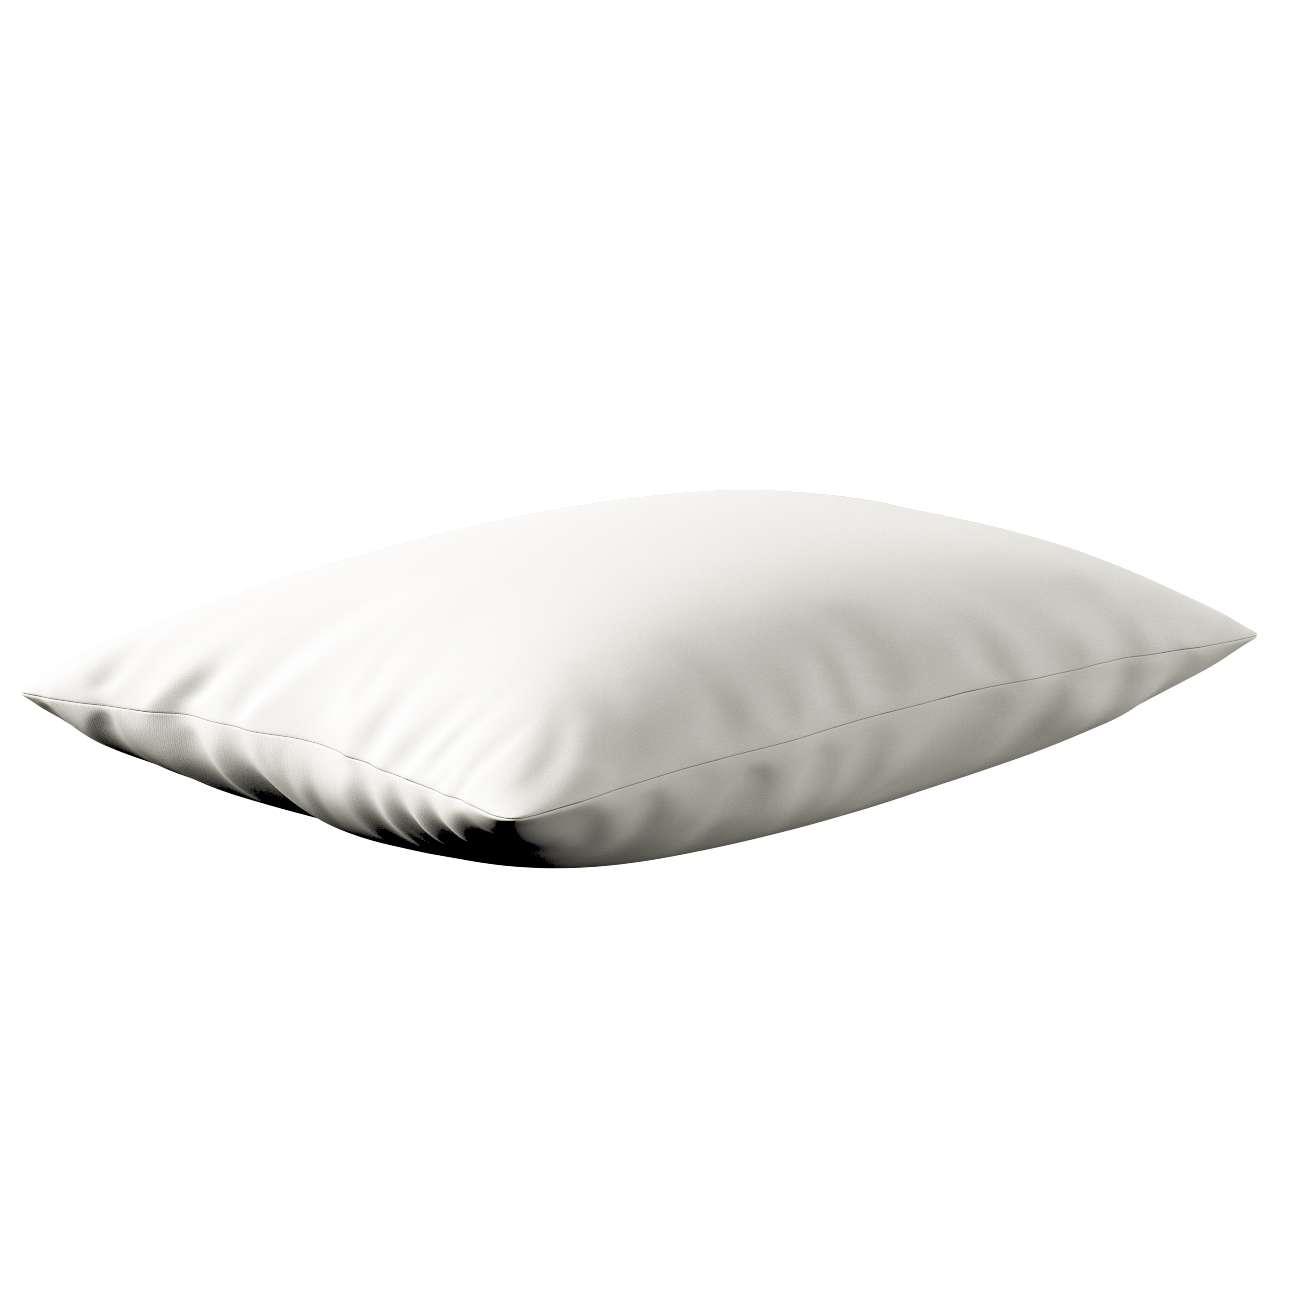 Kissenhülle Kinga 60x40cm 60x40cm von der Kollektion Cotton Panama, Stoff: 702-34